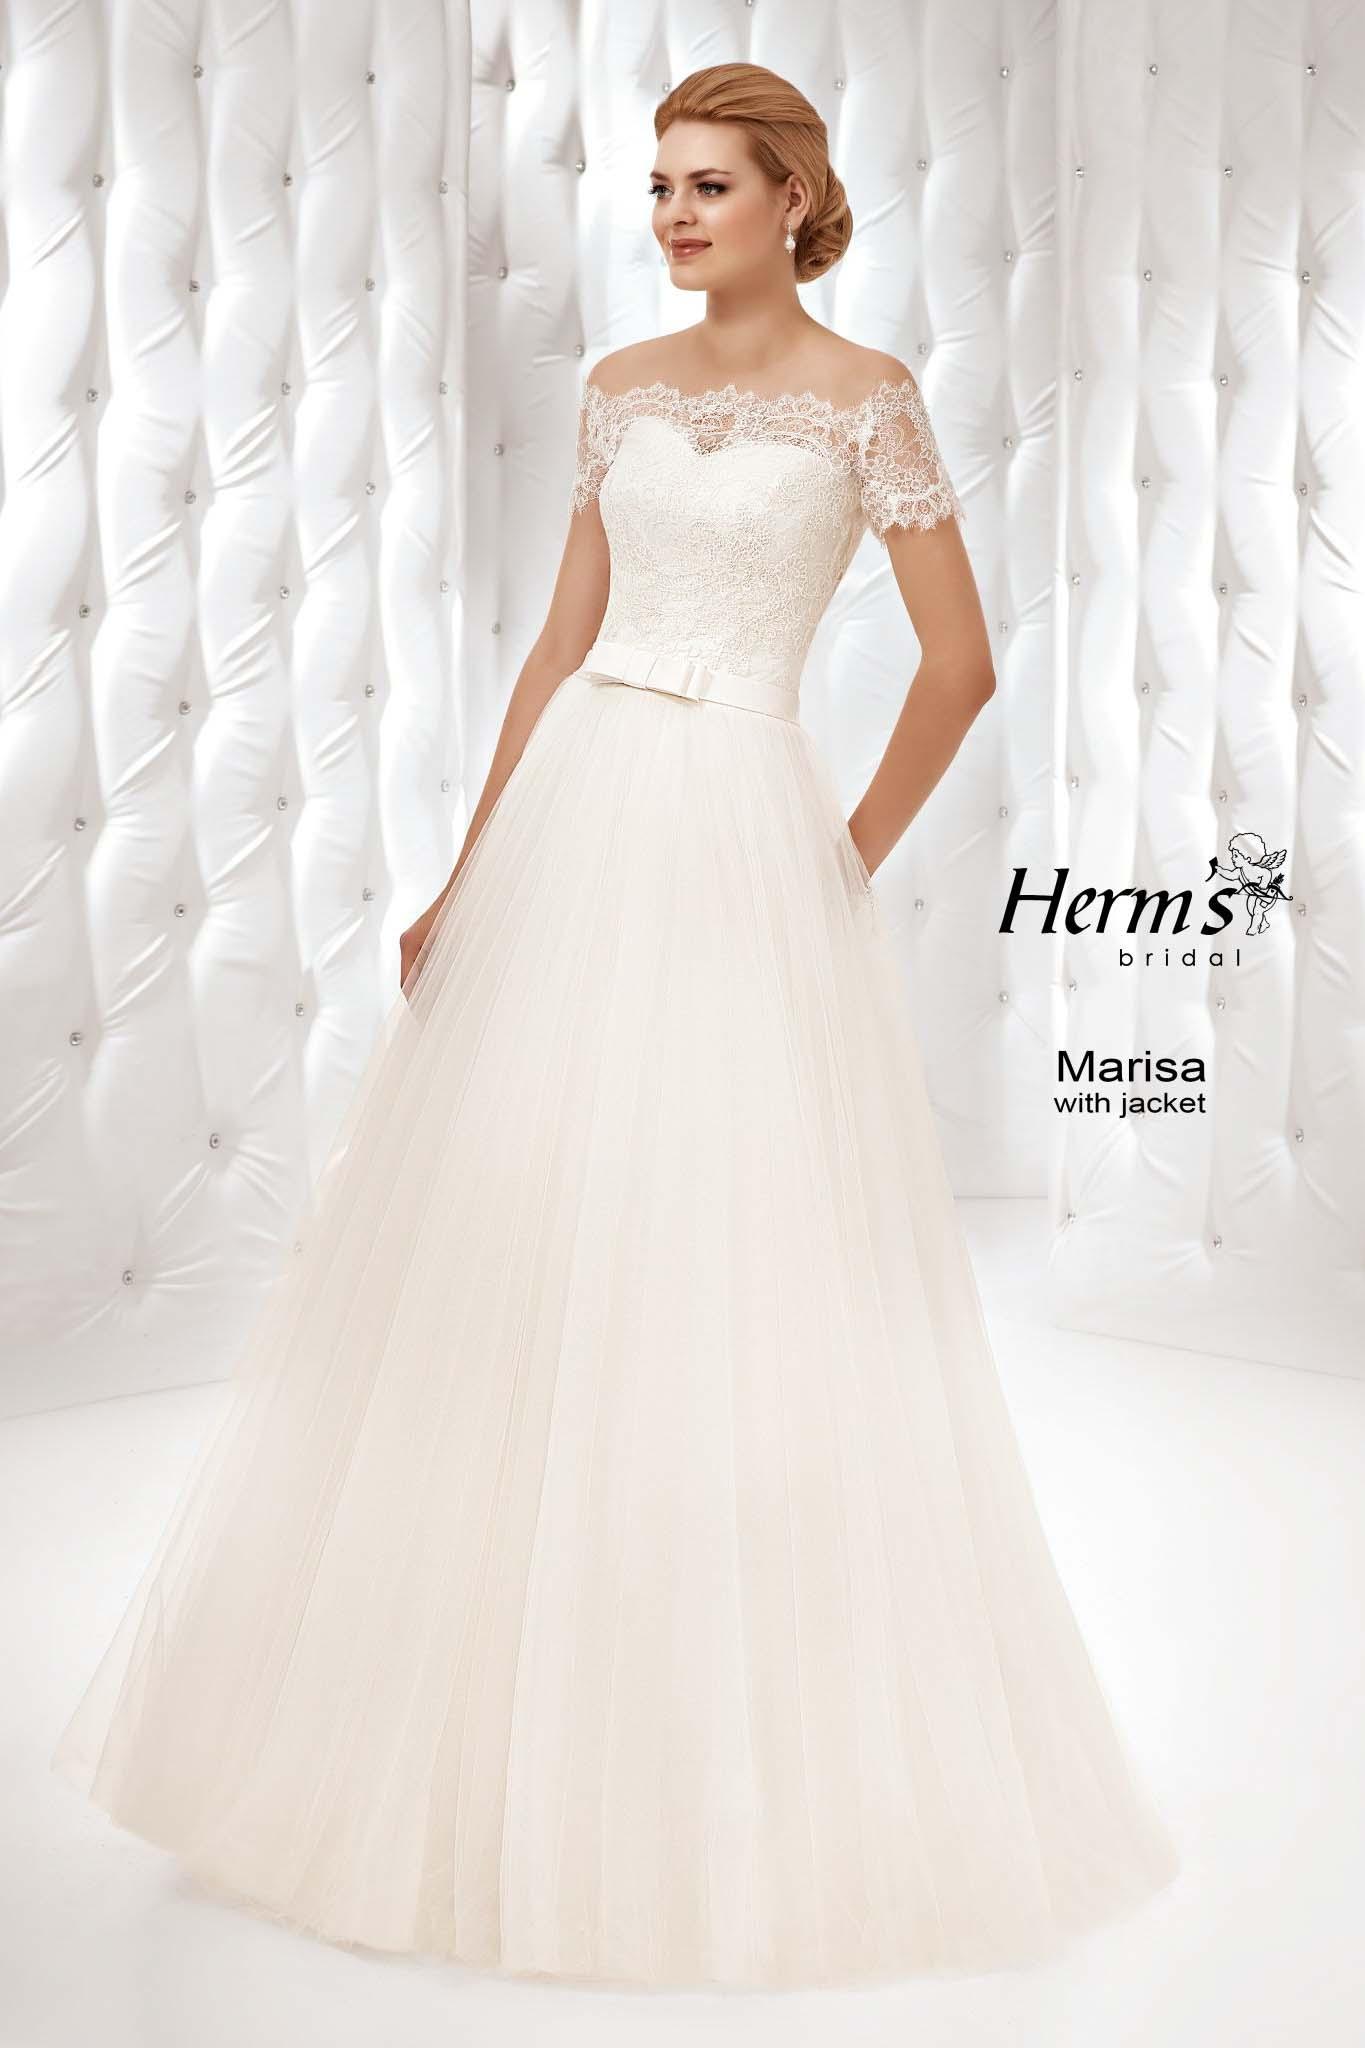 suknia ślubna Herm's Bridal Marisa